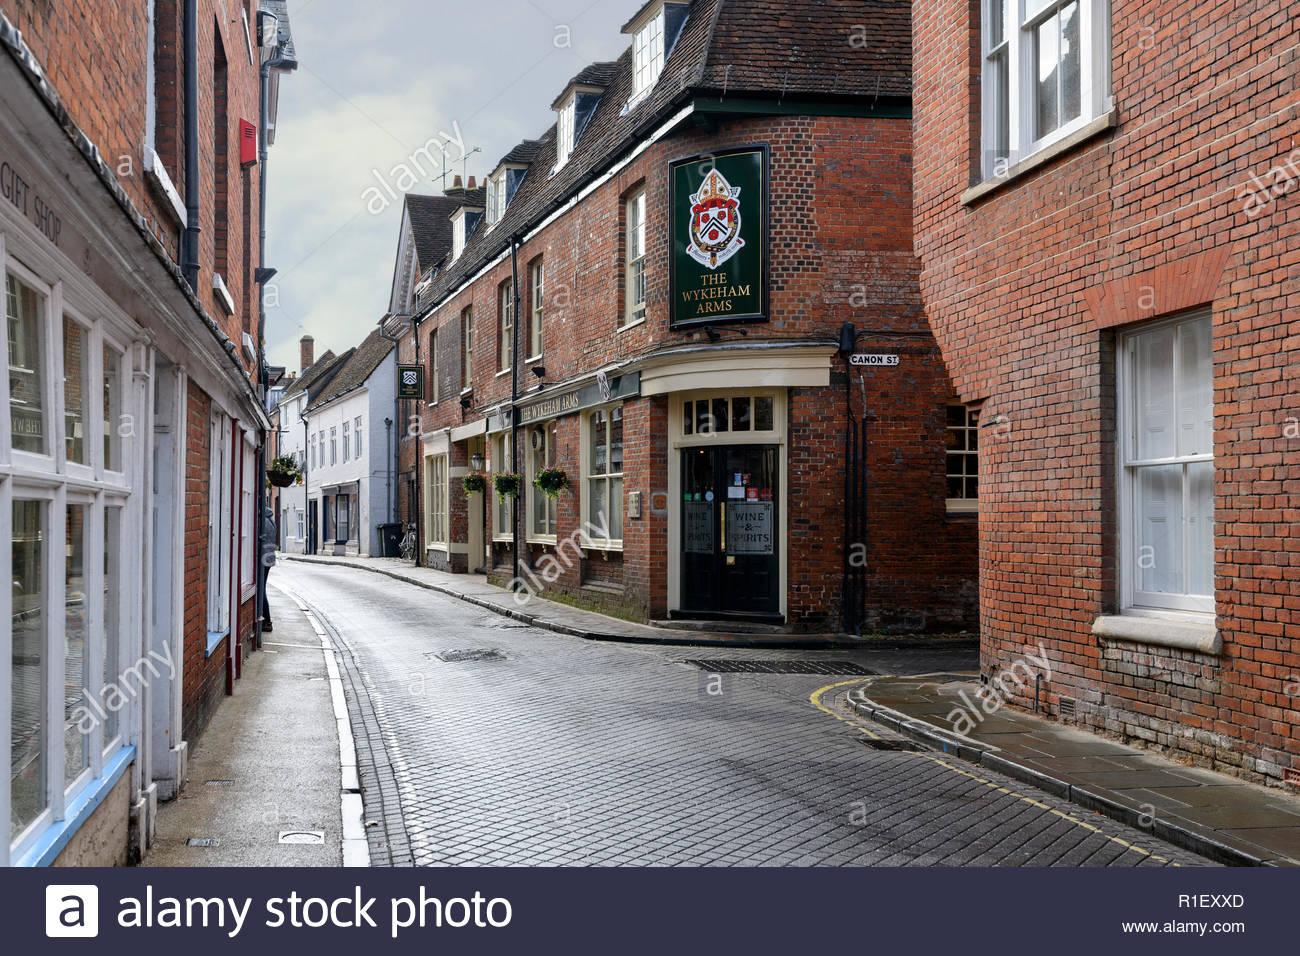 The Wykeham Arms pub, Winchester, Hampshire, England, UK - Stock Image